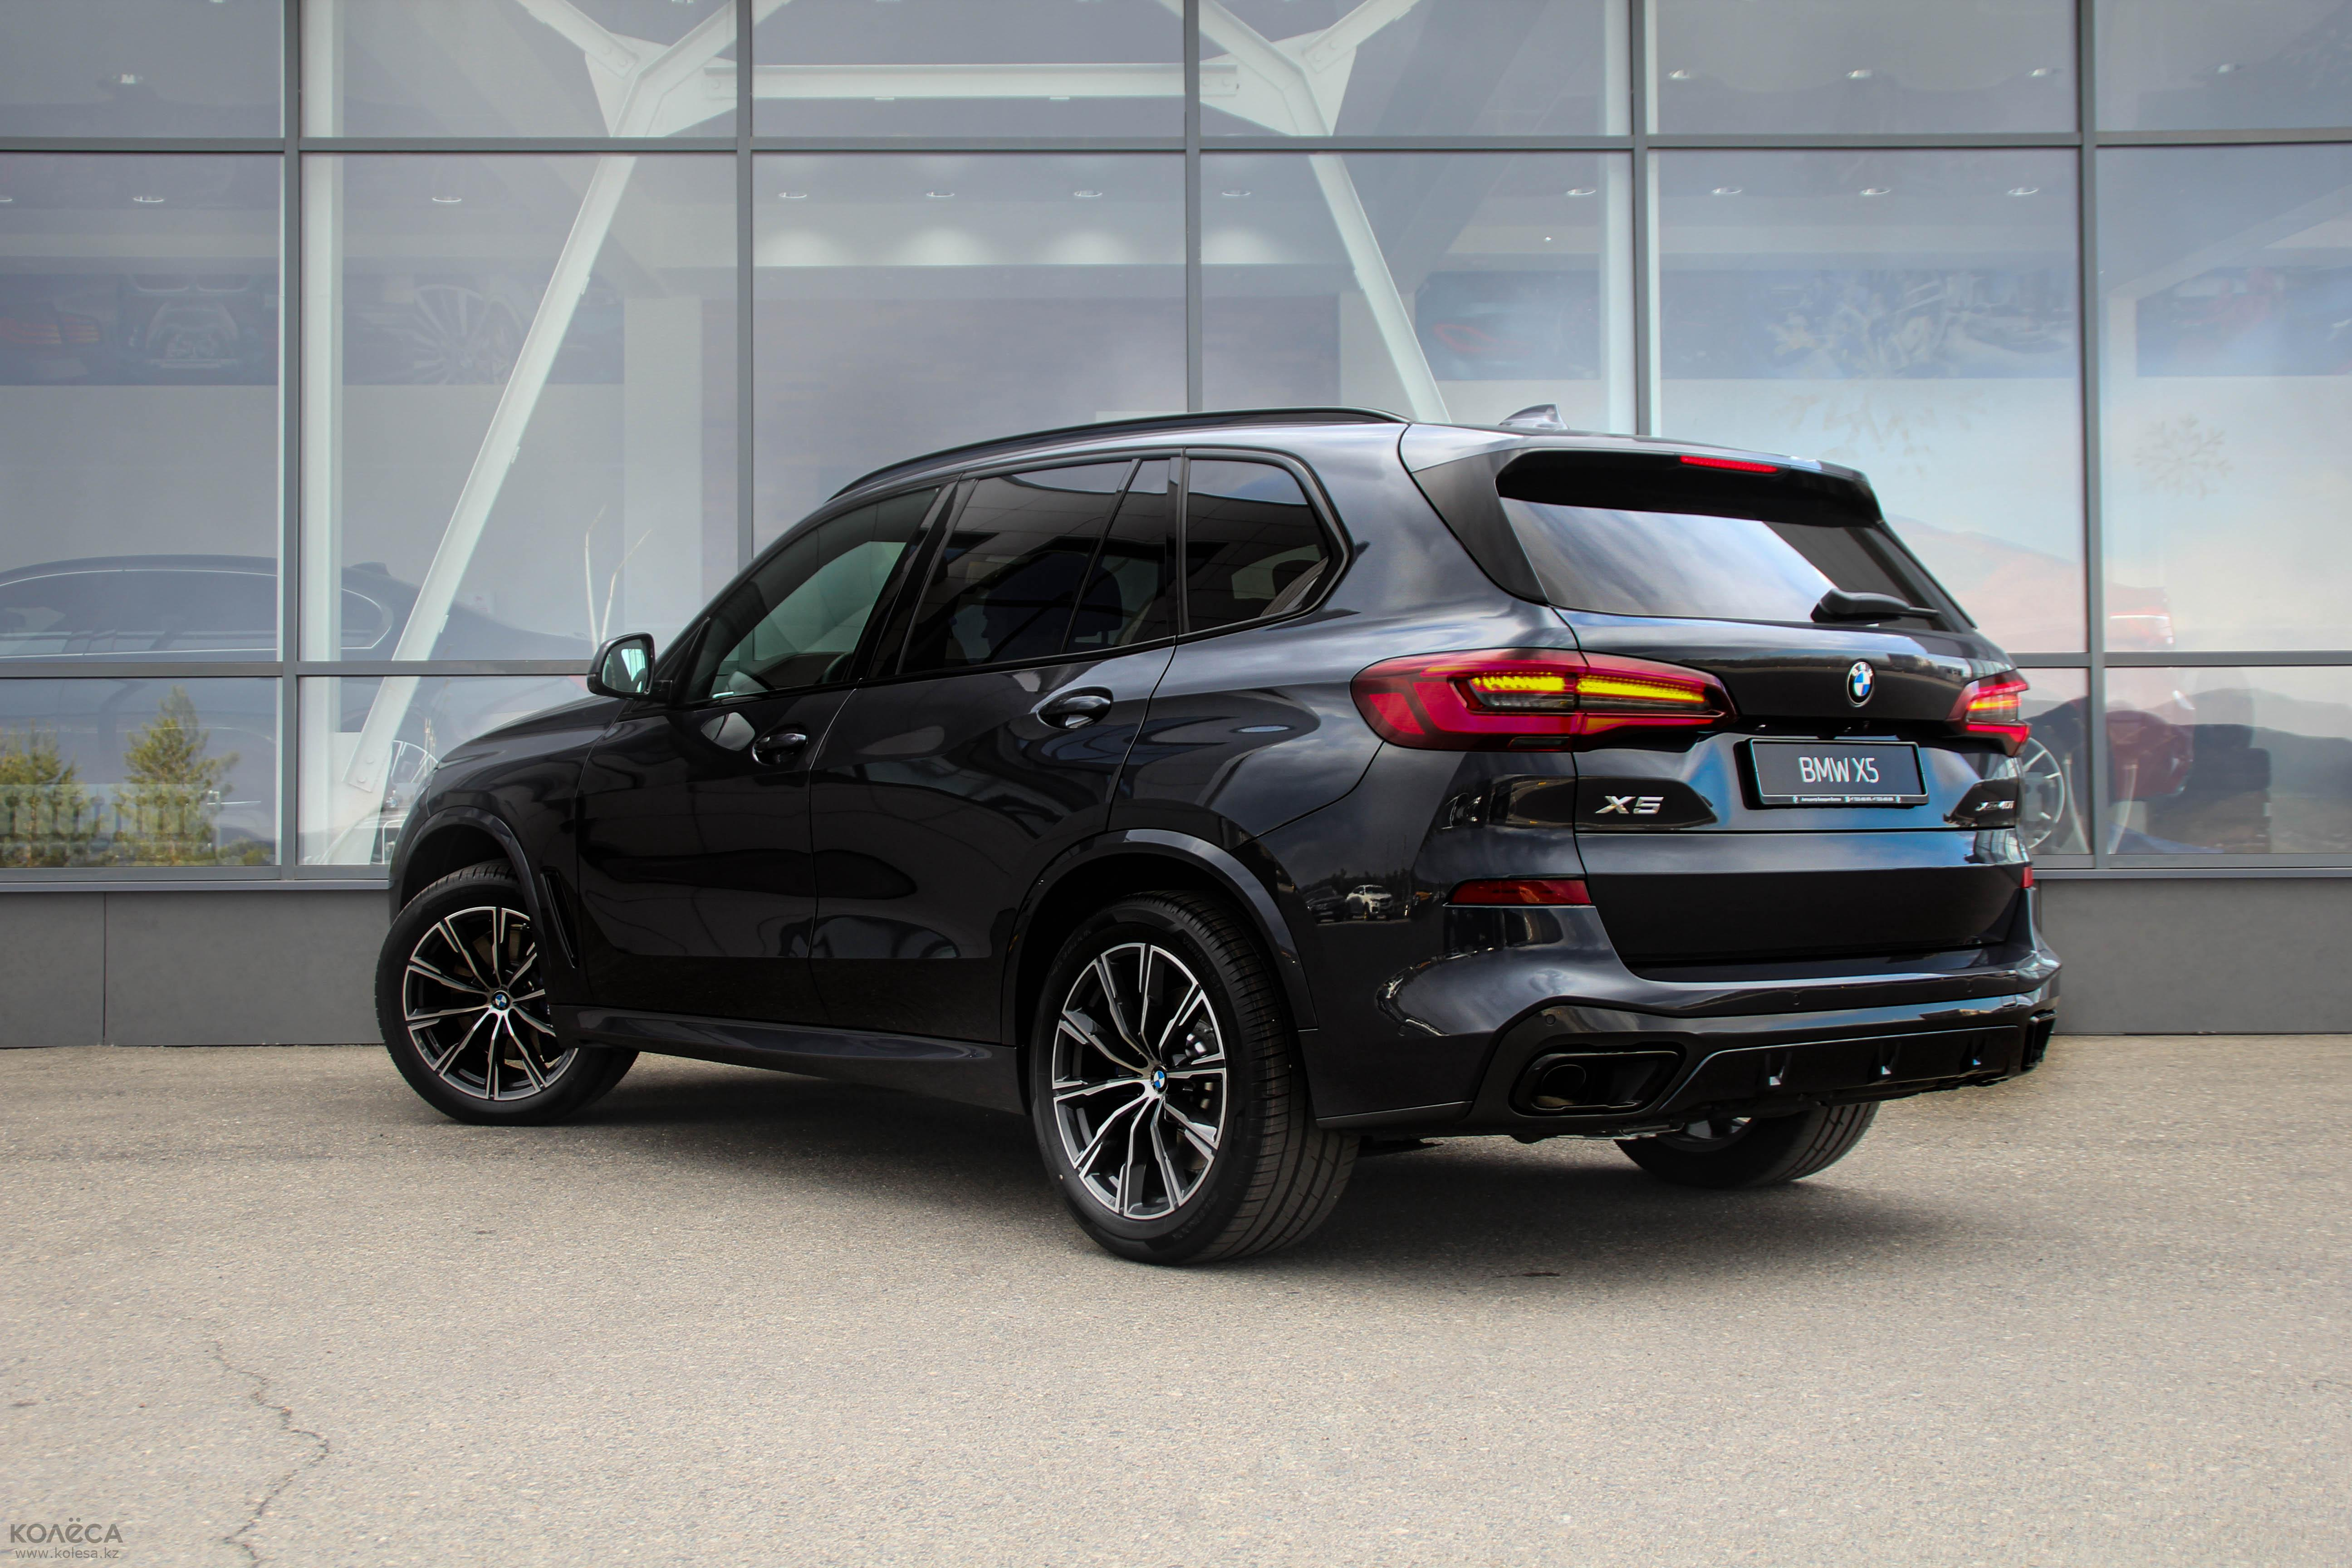 BMW X5 J класса 2020-2021 года от 44 282 000 тенге